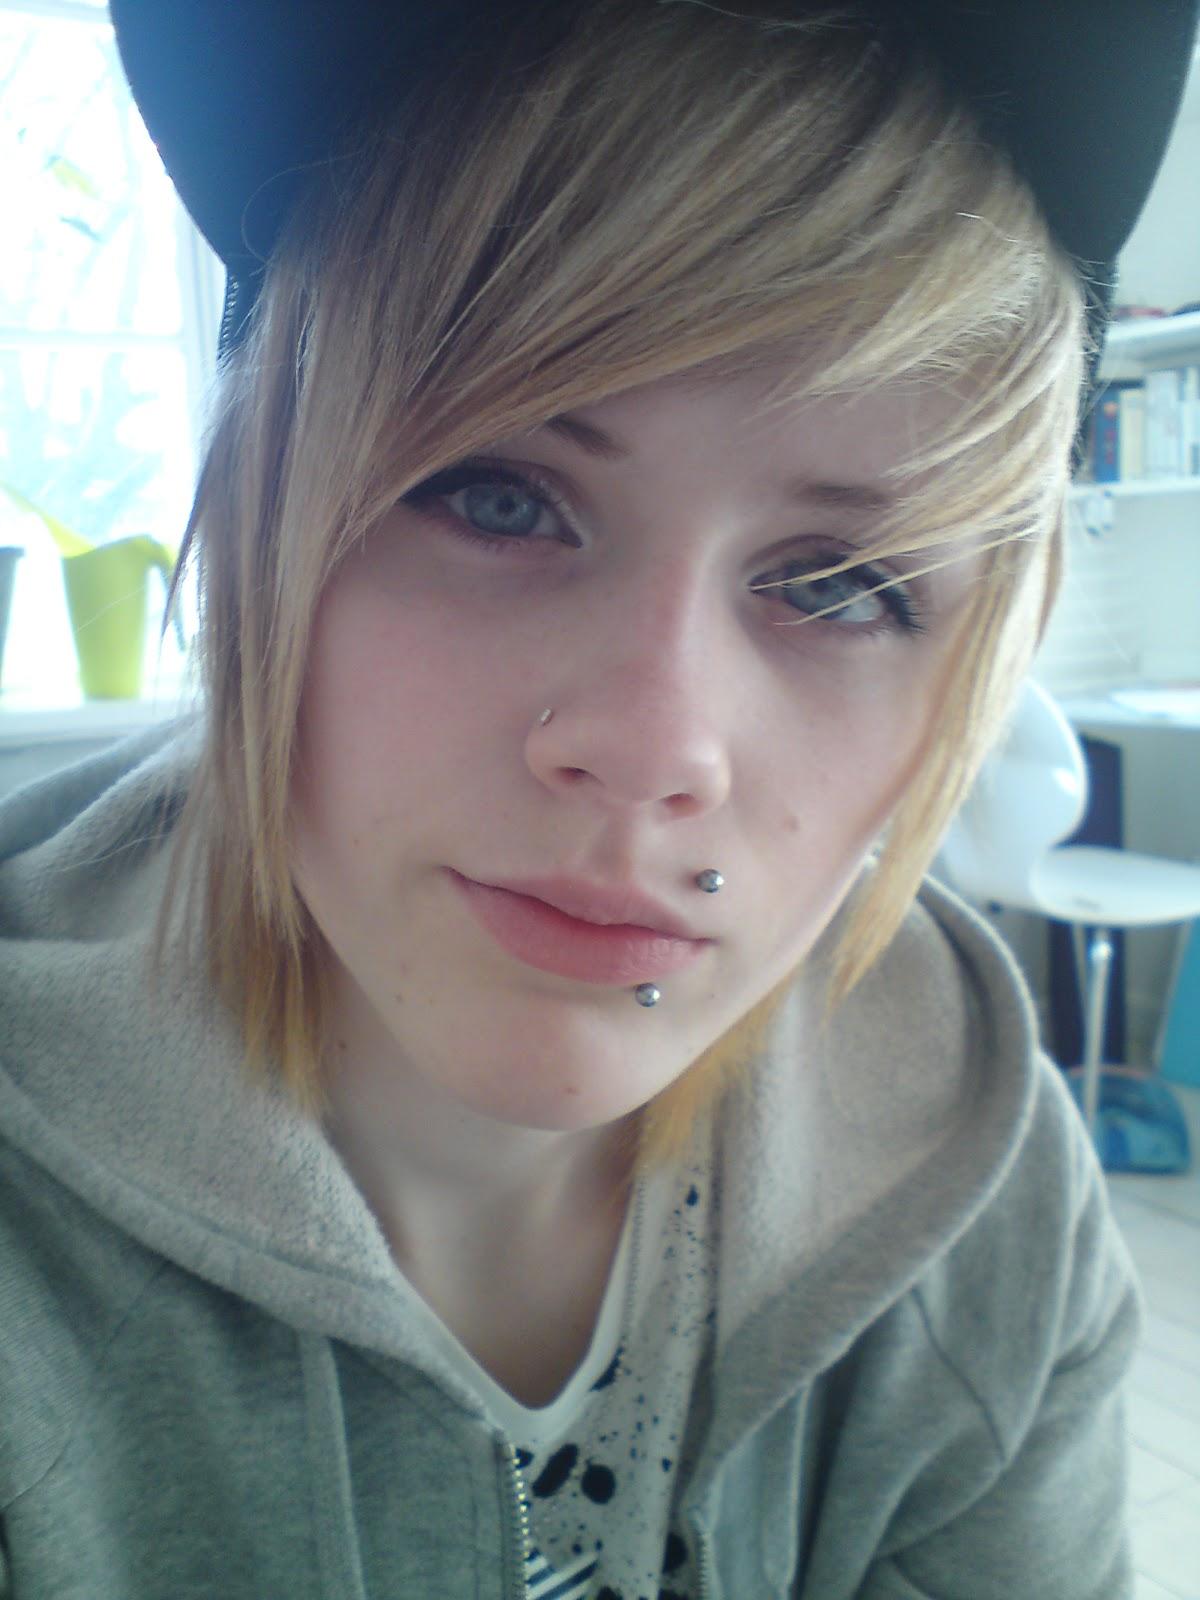 tomboy online dating)